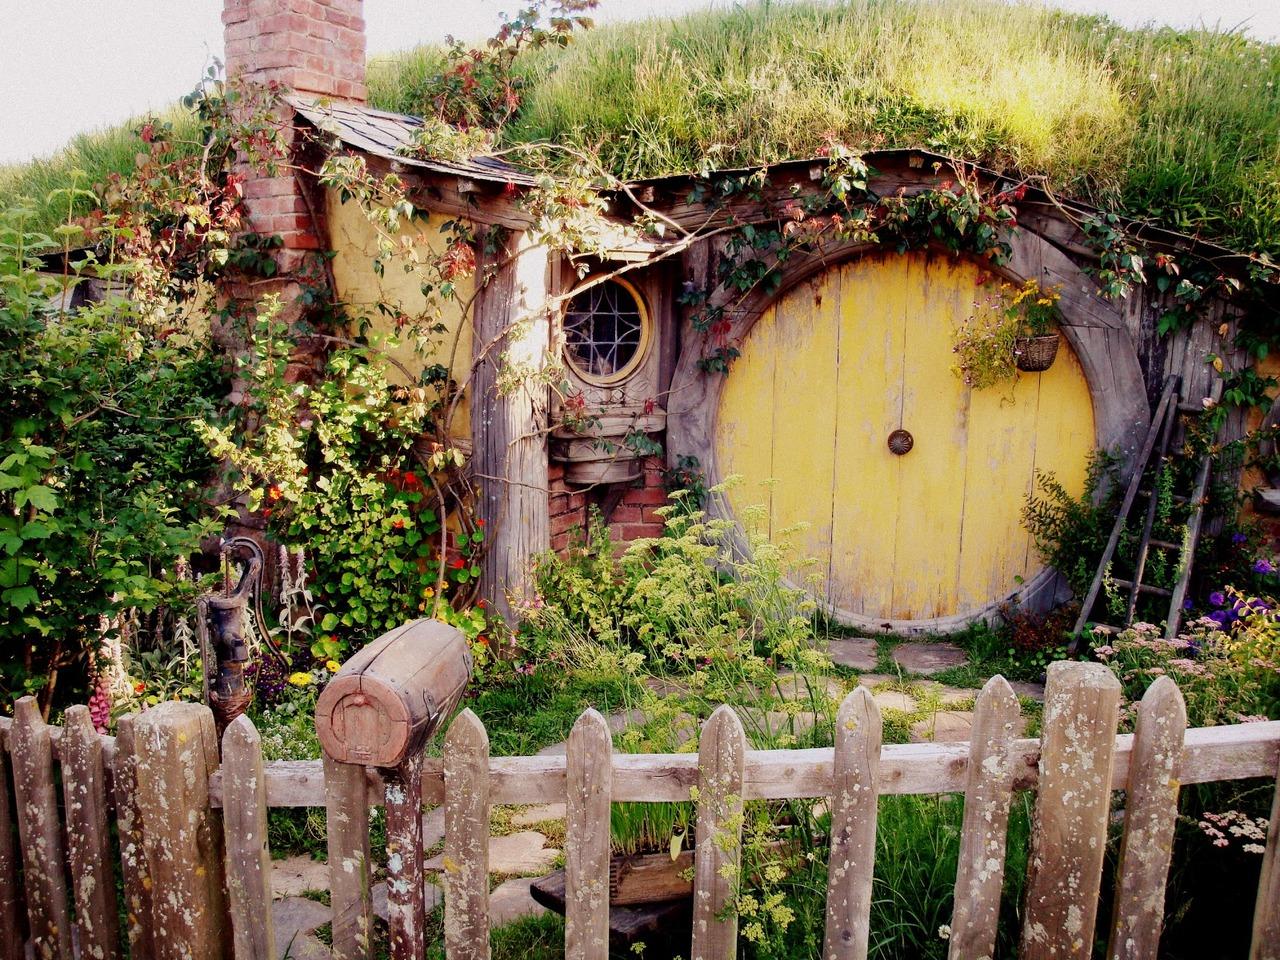 more sweet hobbit house pictures the hobbit movie. Black Bedroom Furniture Sets. Home Design Ideas